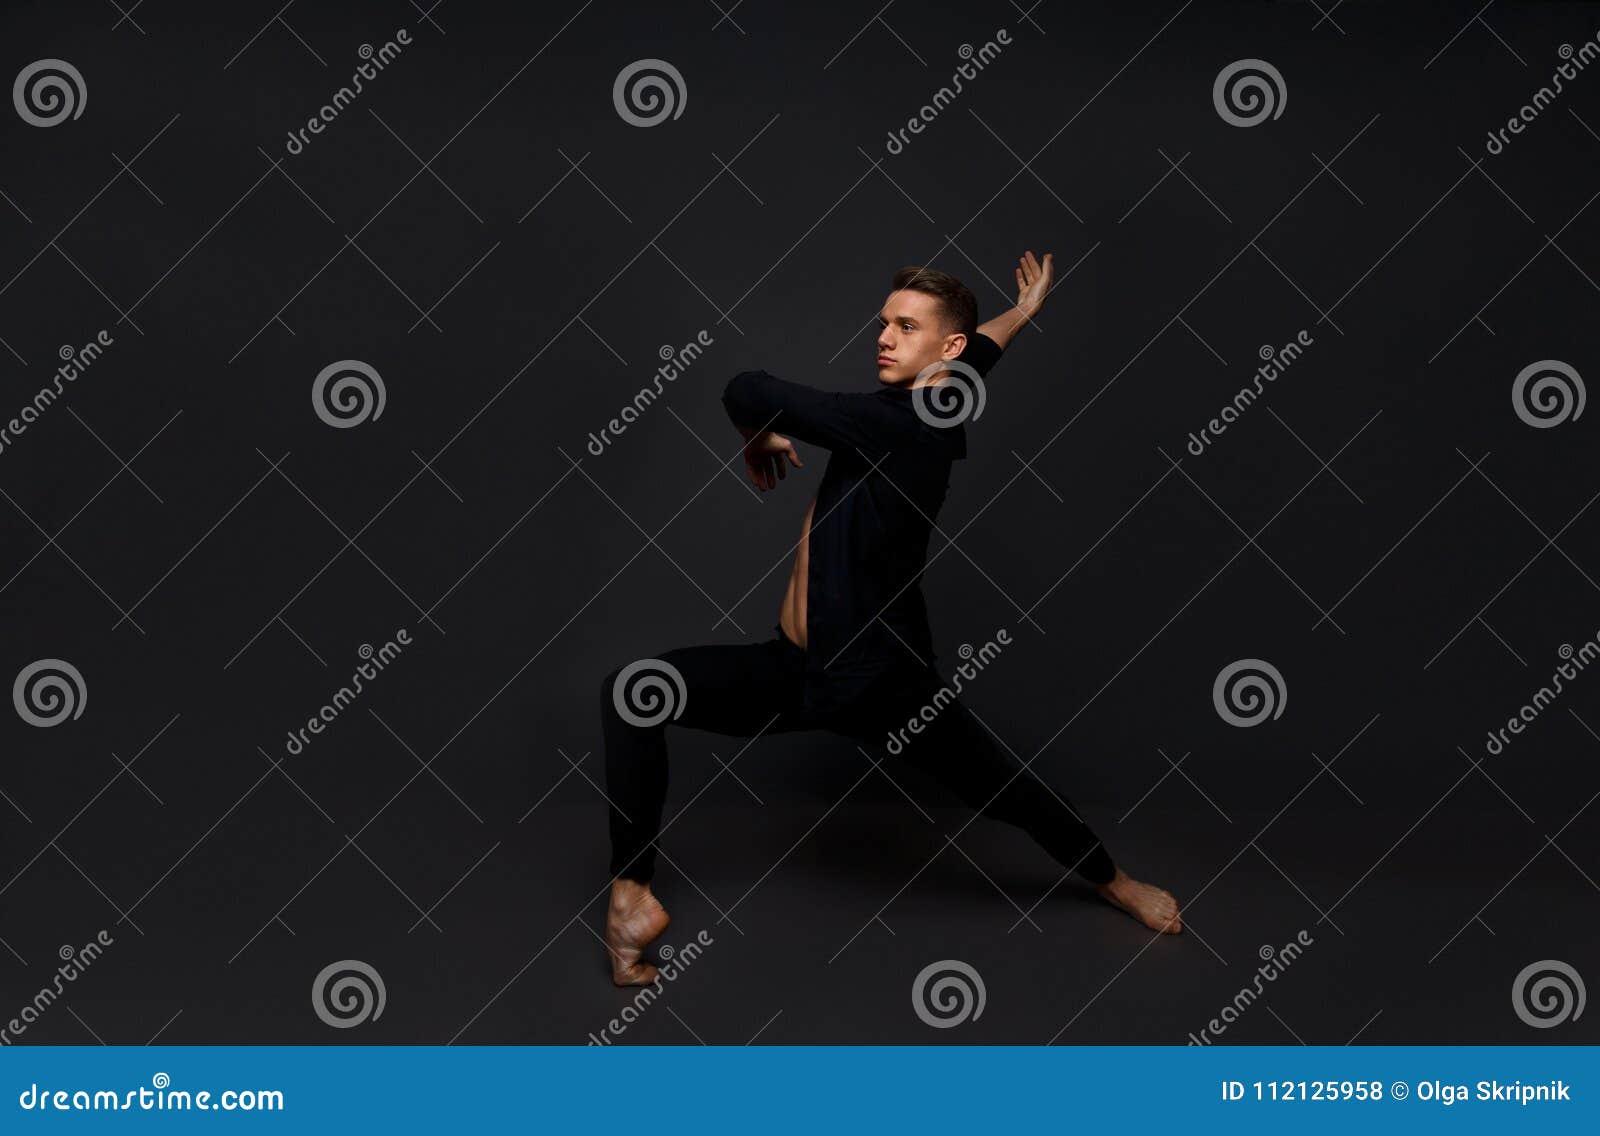 the guy is dancing